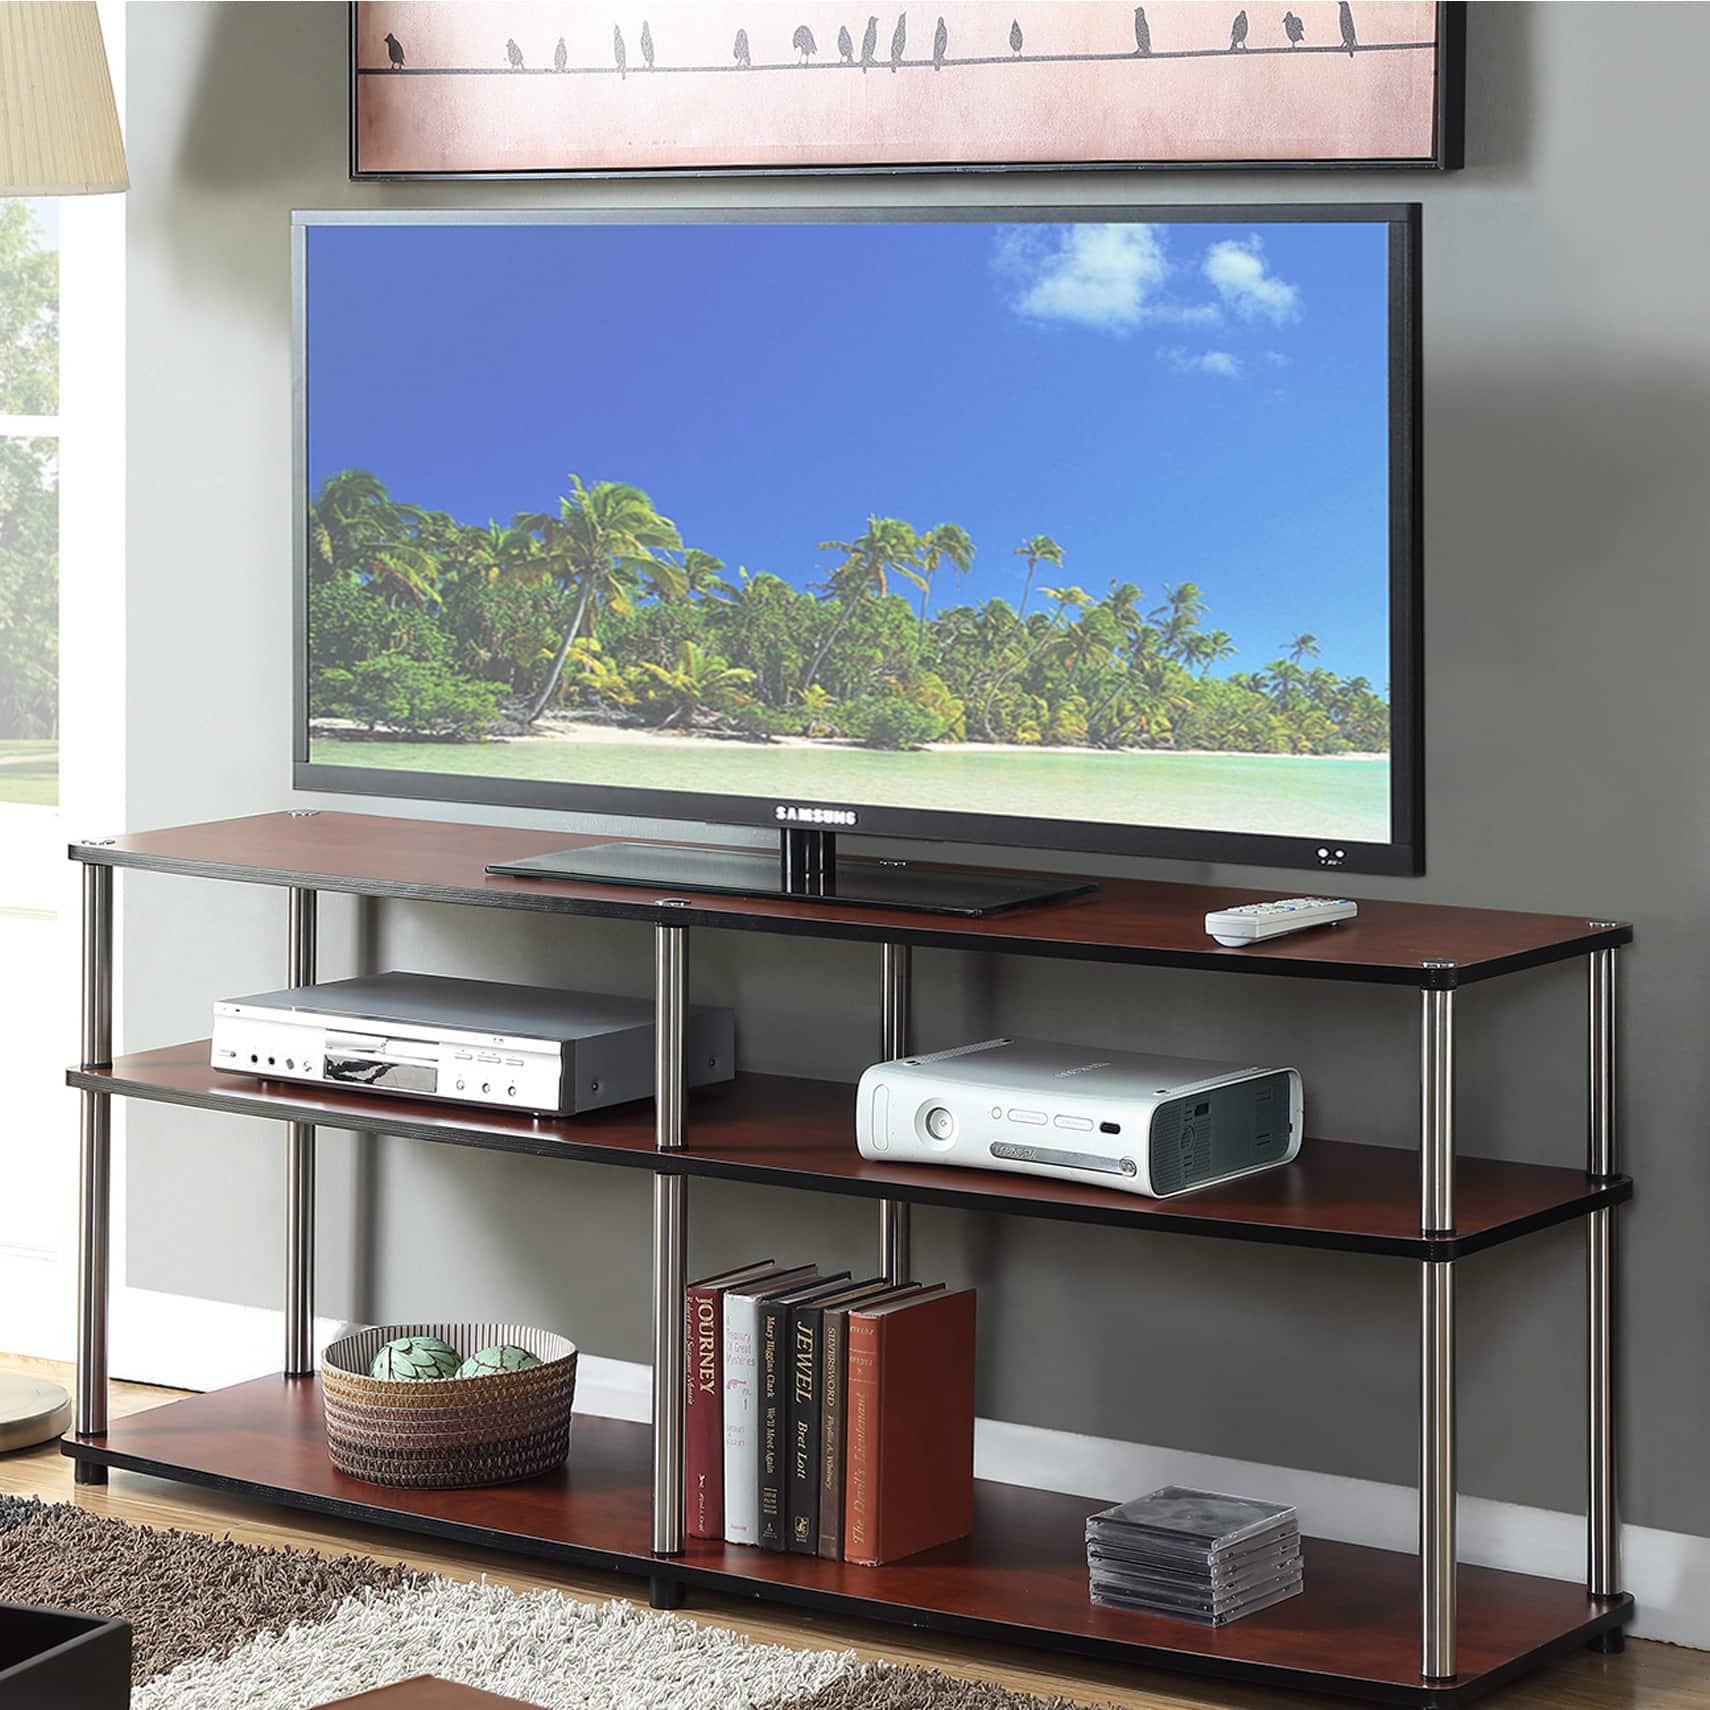 Best Furniture Deals Online: Buy TV Stands & Entertainment Centers Online At Overstock